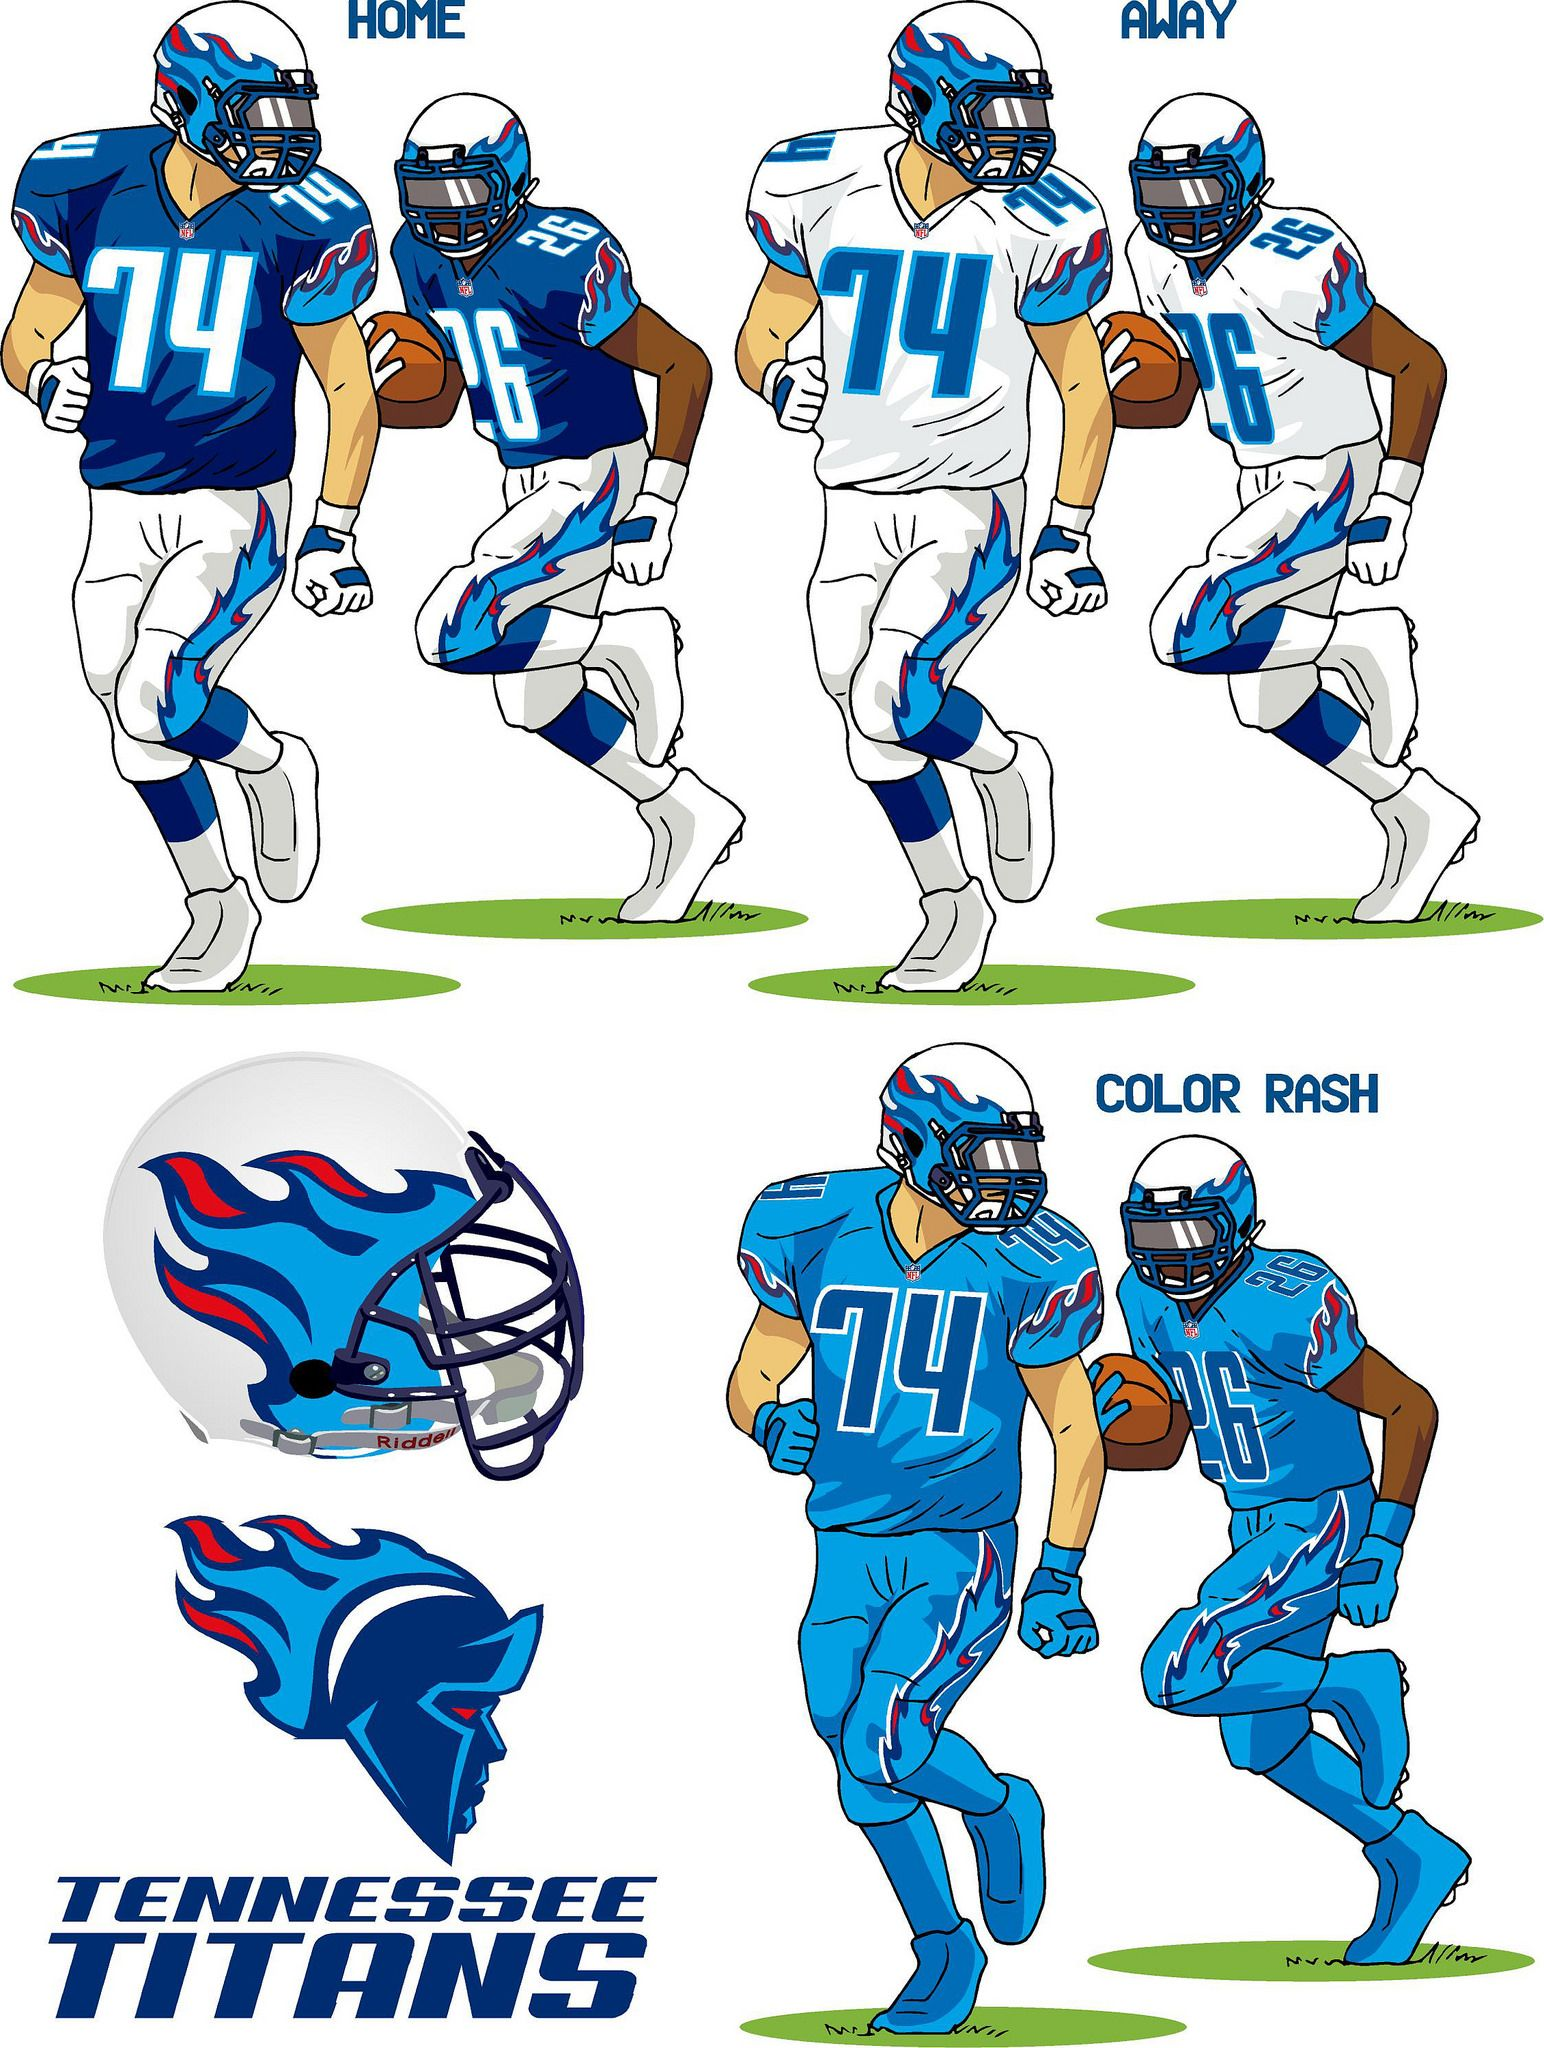 Who won our Titans redesign contest? Titans football